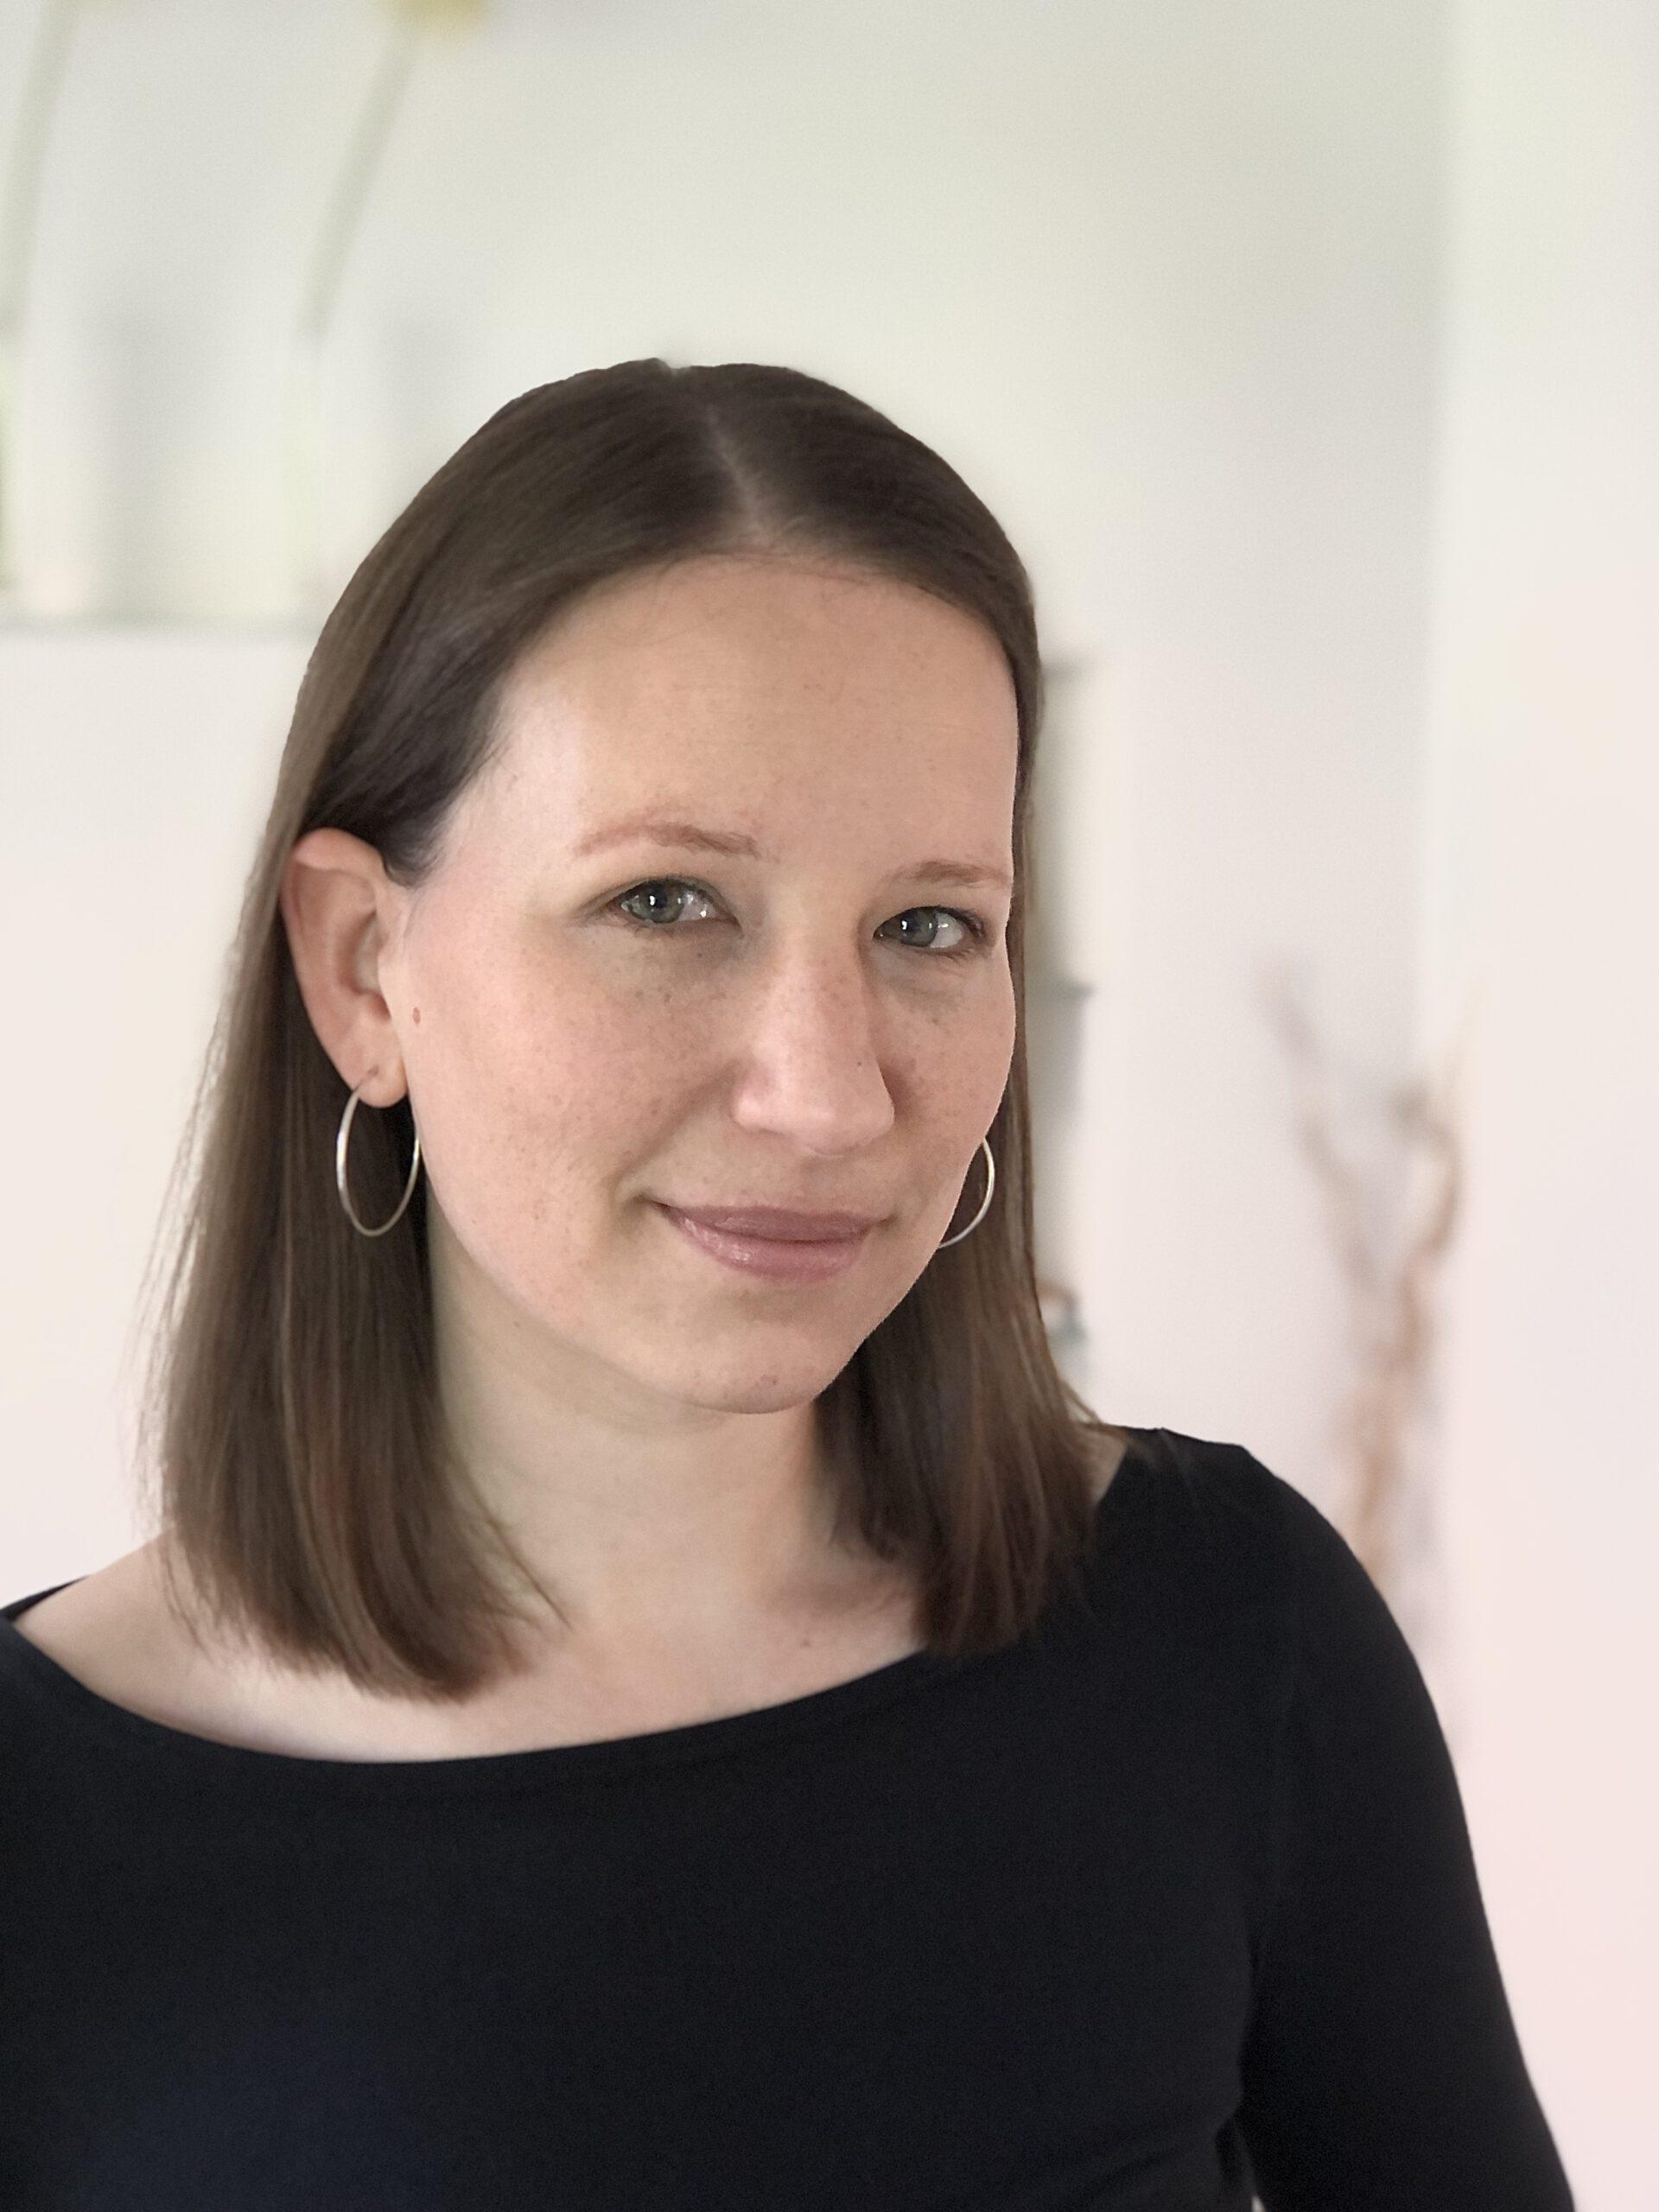 Julia Hartel